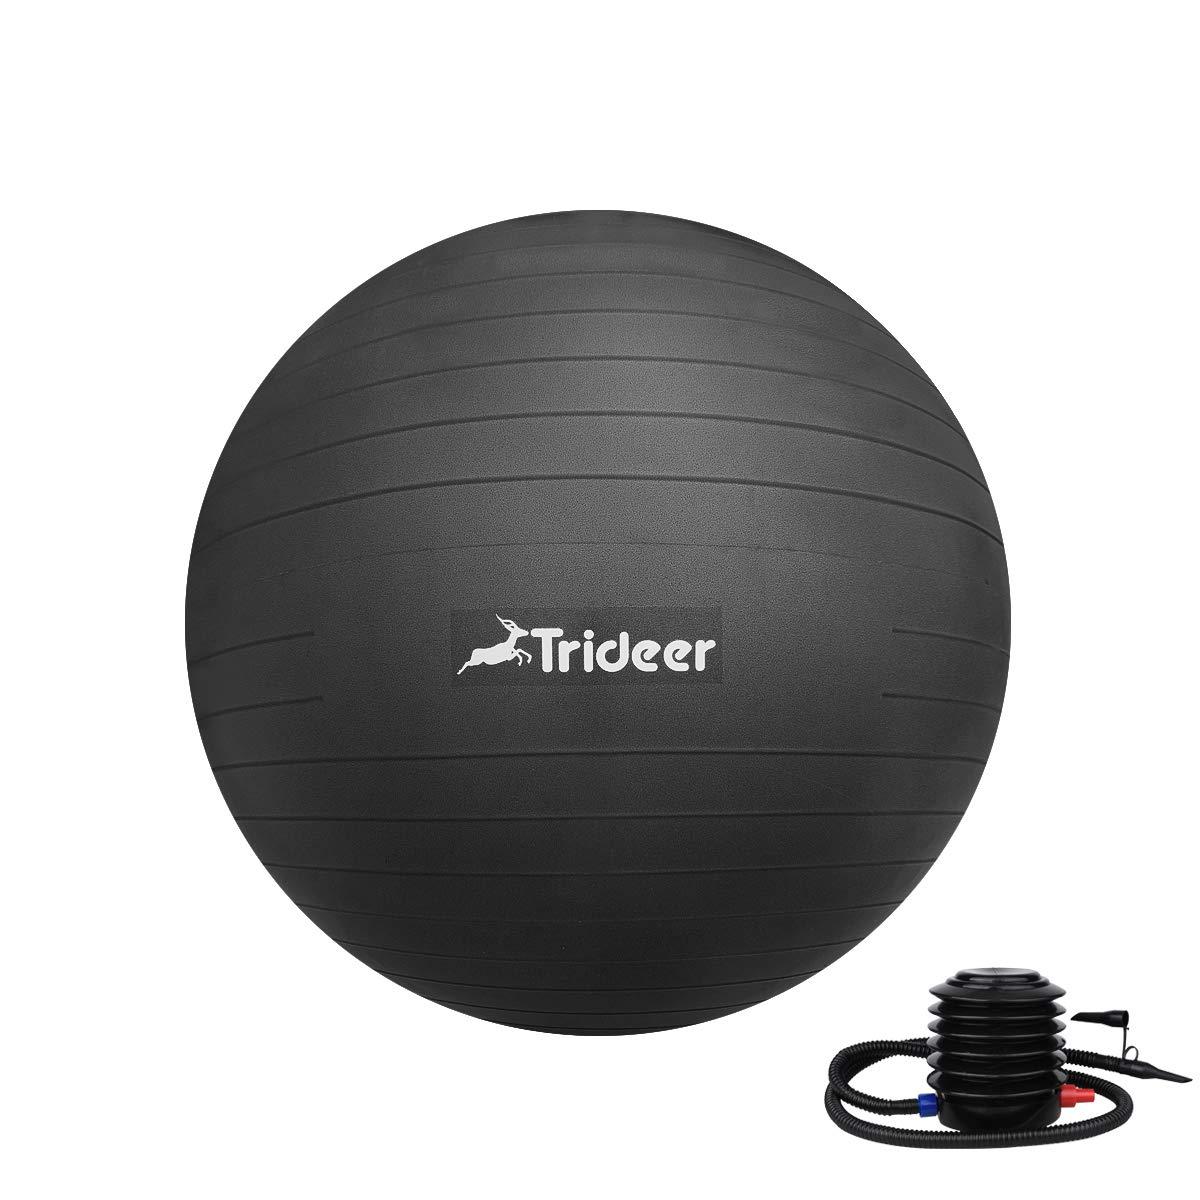 Trideer 45-85cm Exercise Ball, Birthing Ball, Yoga Pilate Fitness Balance Ball Lug Kit, Anti-Slip & Anti-Burst, 2000lbs Extra Thick Core Cross Training Ball (Black, 65cm)